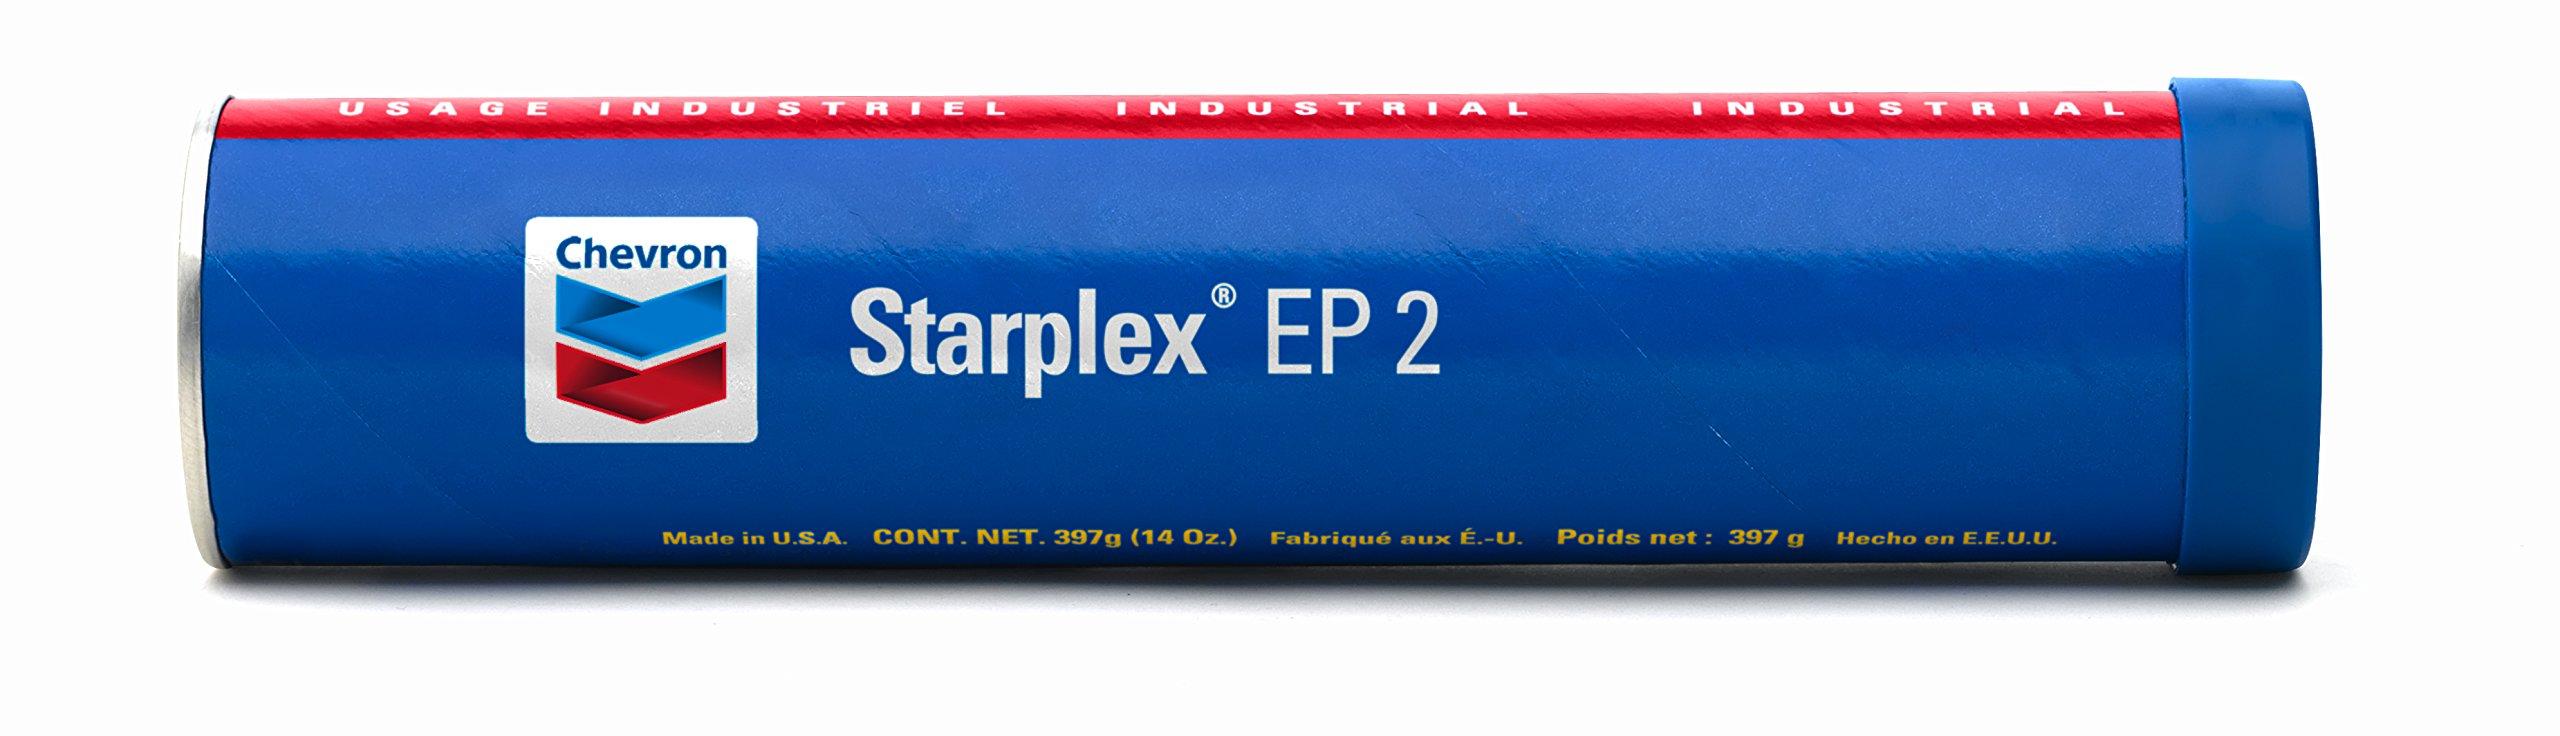 Chevron 277111652 Starplex Grease Ep2 (Pack of 10) by Chevron (Image #1)